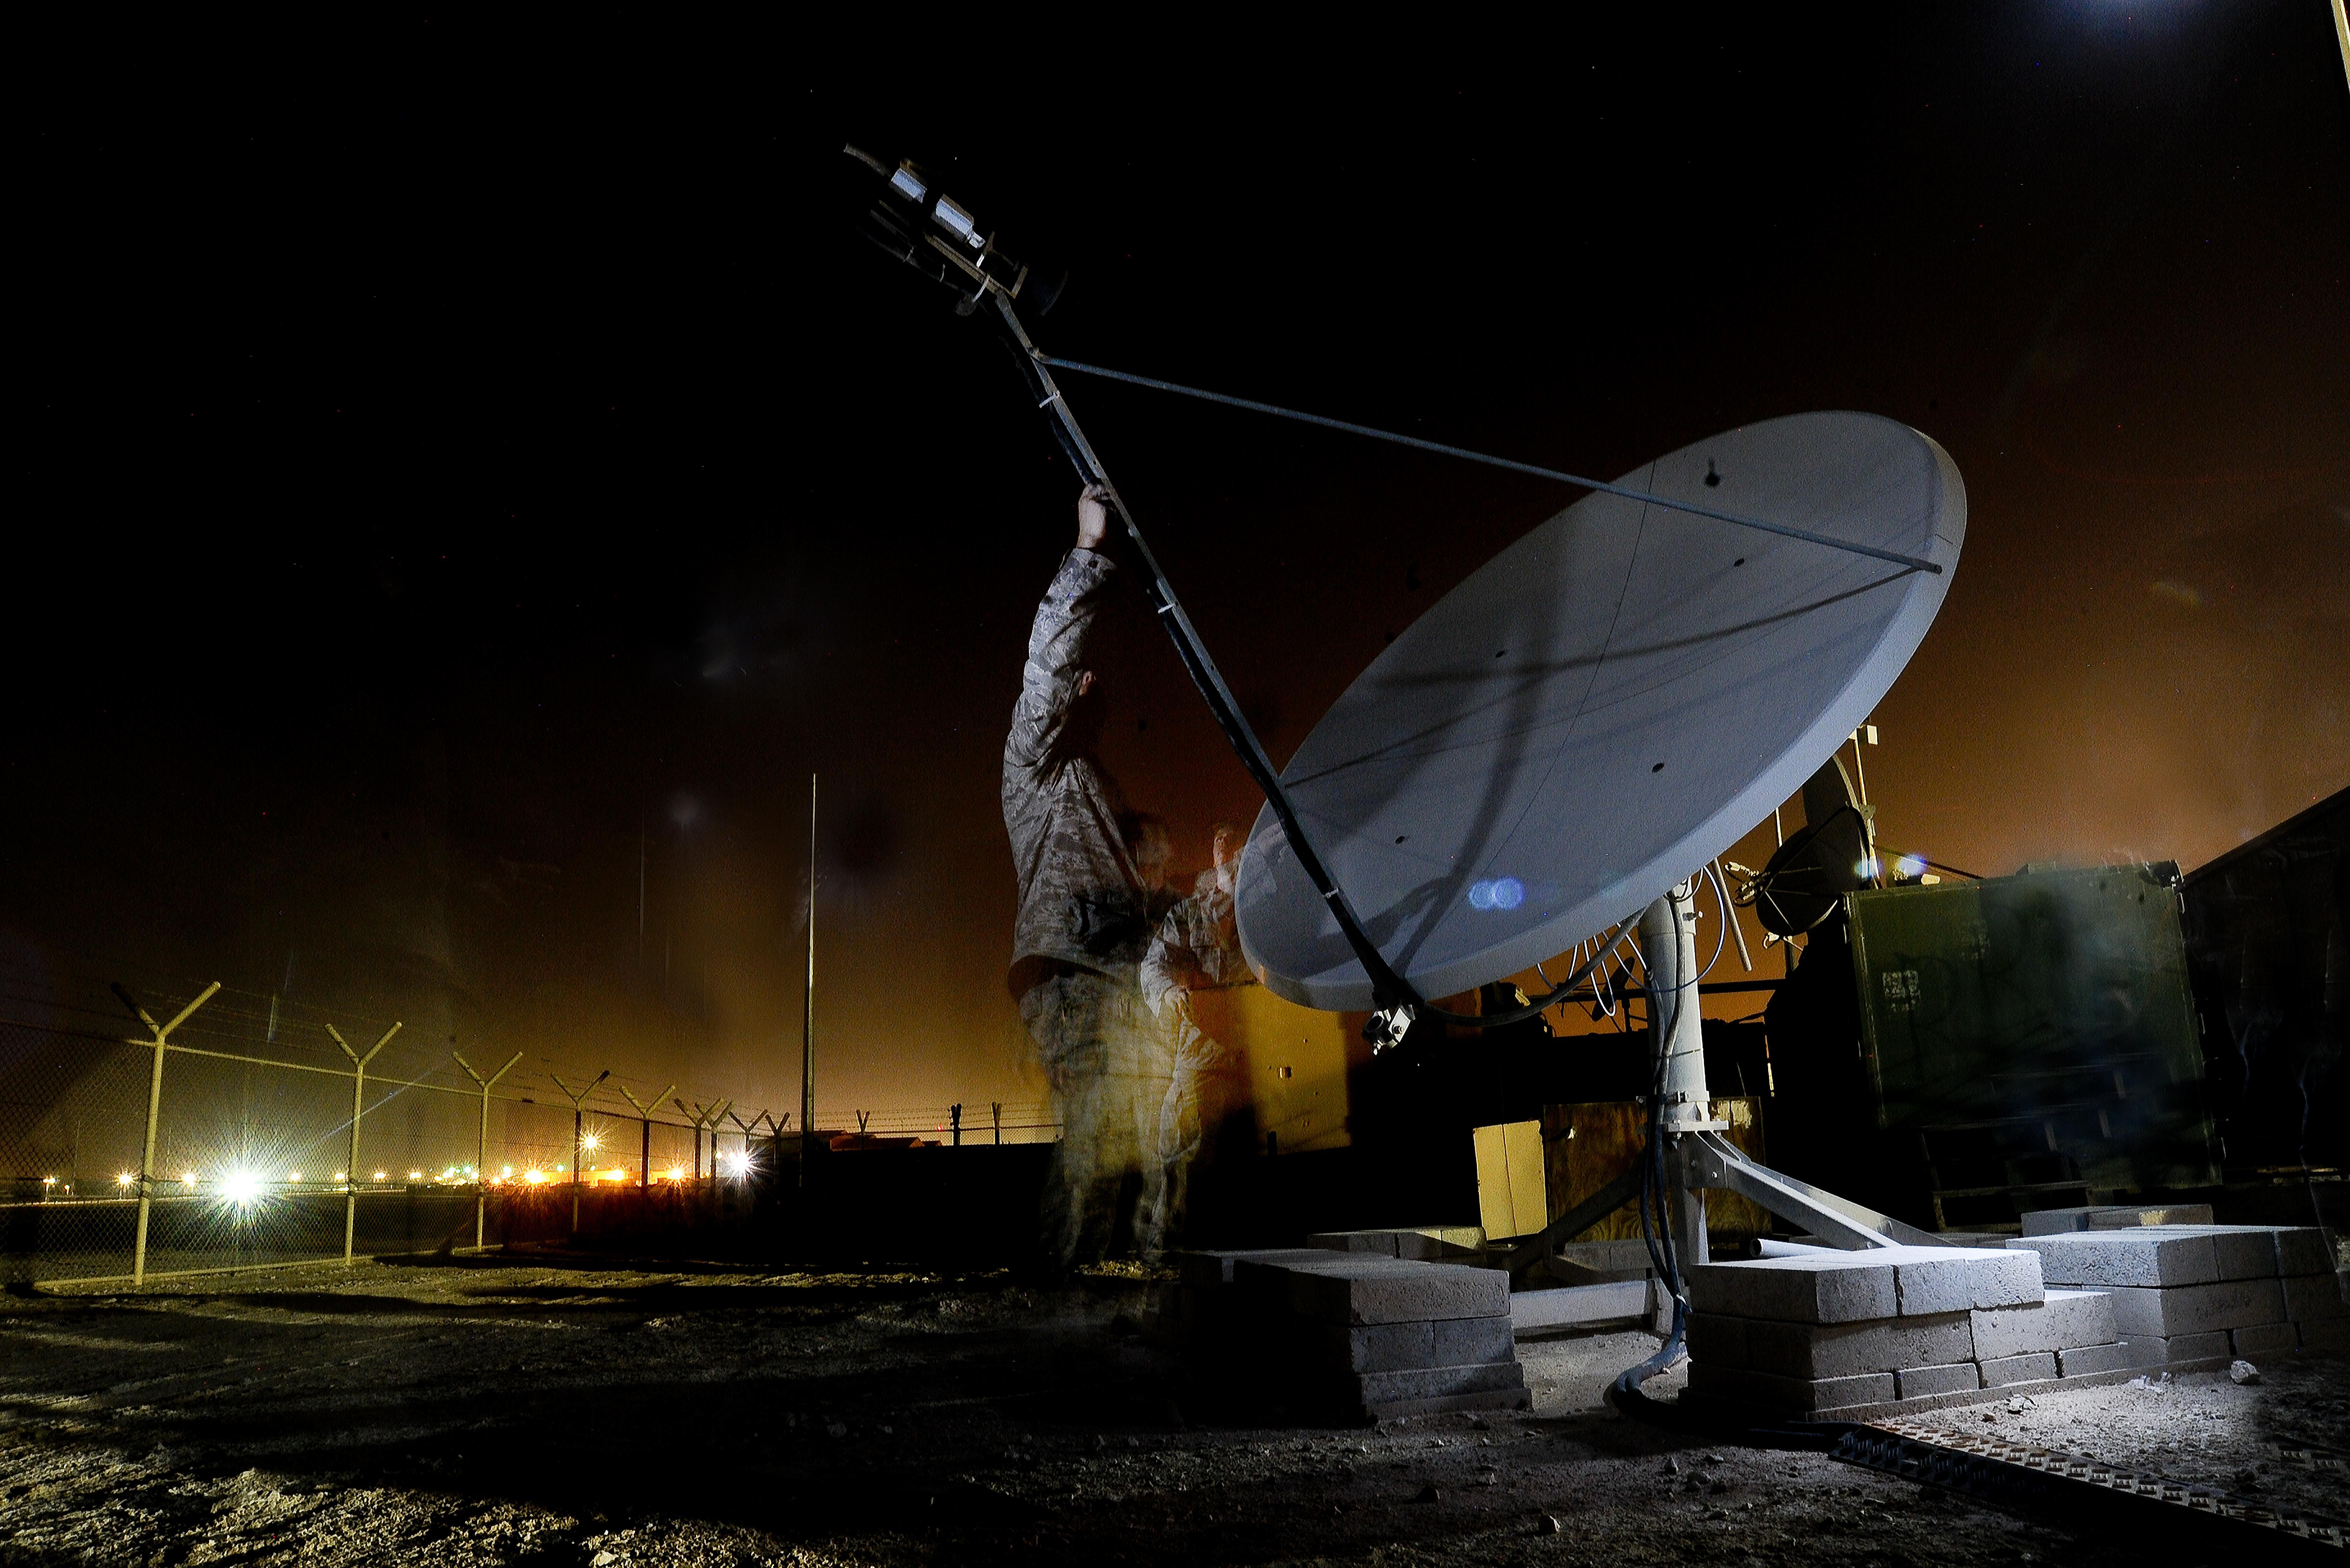 Silent Sentry meets a decade of interstellar combat support > U.S. ...